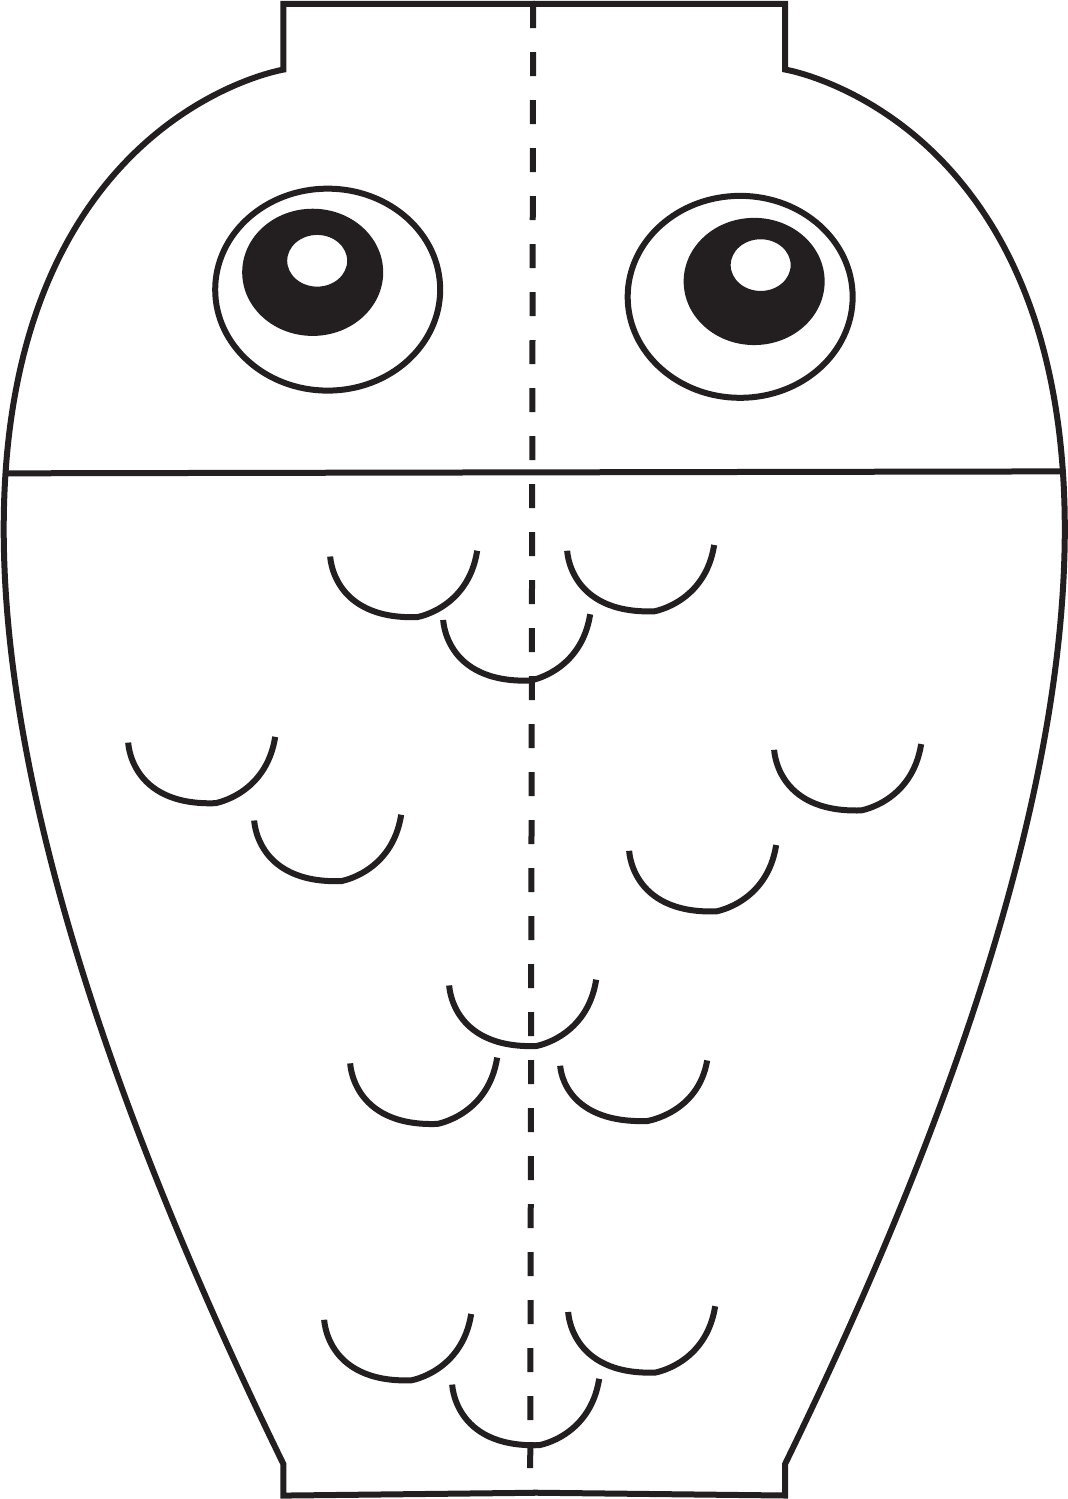 carp kite template activities for kids pinterest kite template art classroom management. Black Bedroom Furniture Sets. Home Design Ideas